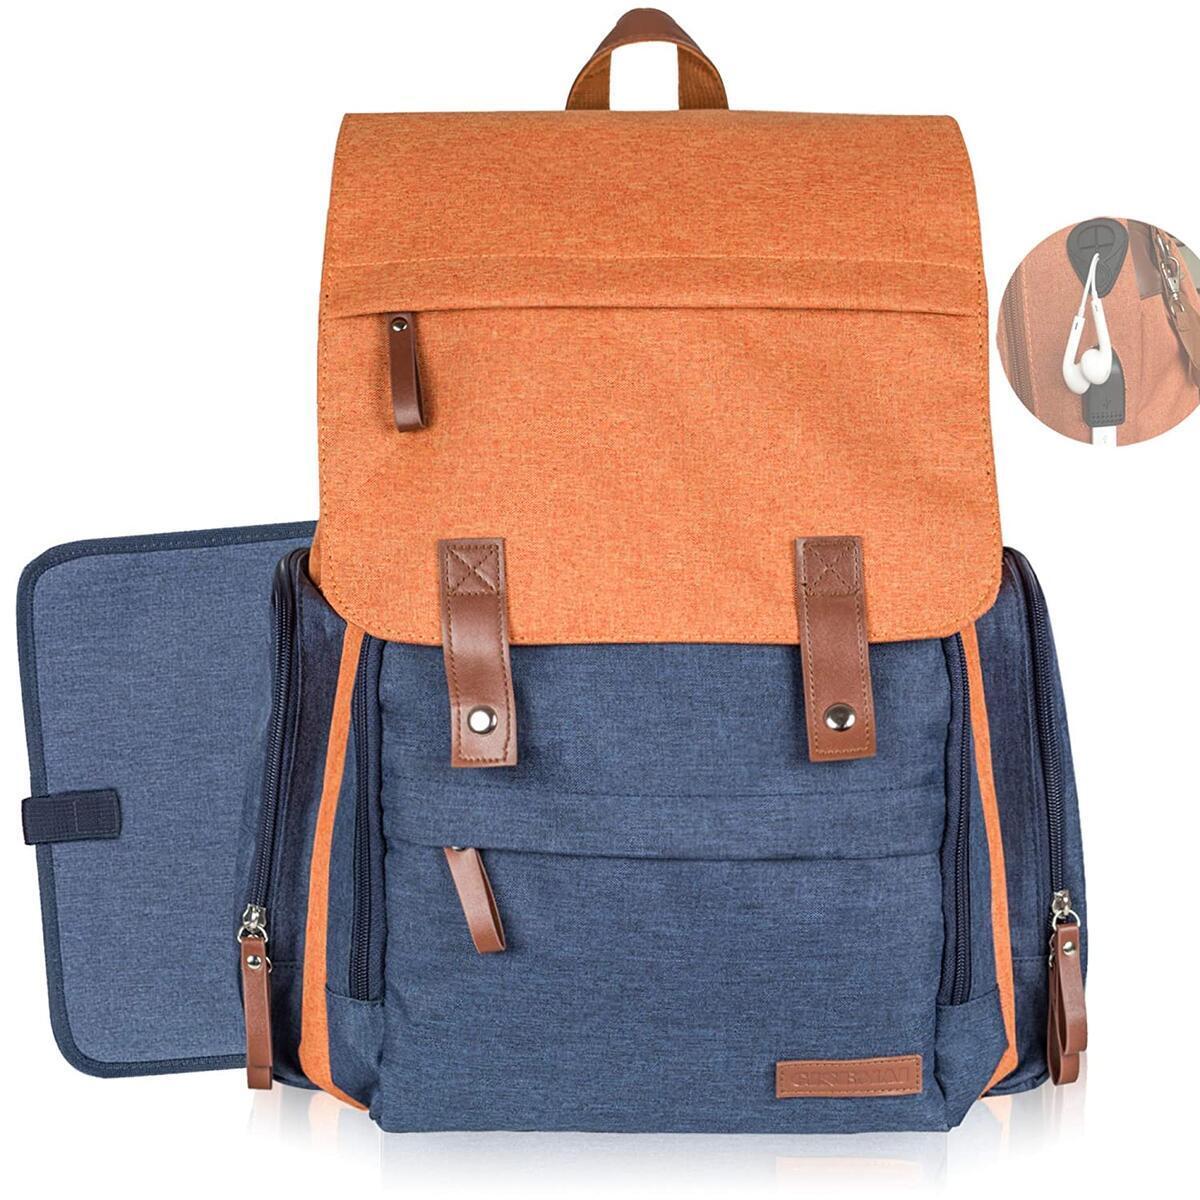 GISEMAI Diaper Bag Backpack   Maternity Bag   Diaper Backpack for Baby Shower Registry   Diaper Bags for Baby Girl & Baby Boy Stuff   Mommy Bag & Dad Diaper Bag (Tile Red & Navy Blue)